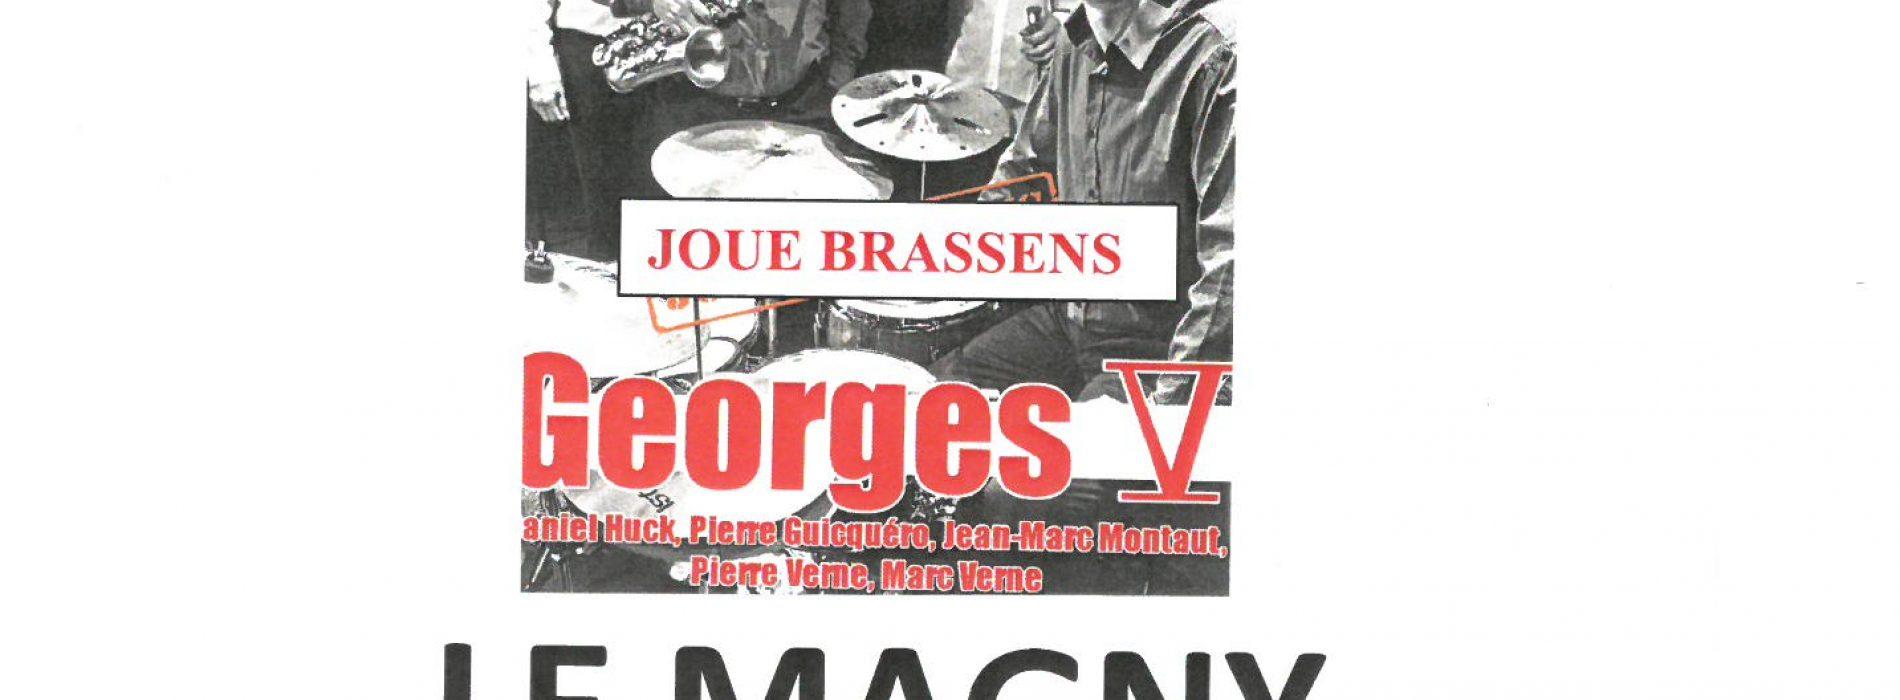 HOMMAGE A GEORGES BRASSENS  1ER JUILLET -20H30 CENTRE SOCIO CULTUREL L'ECLAM